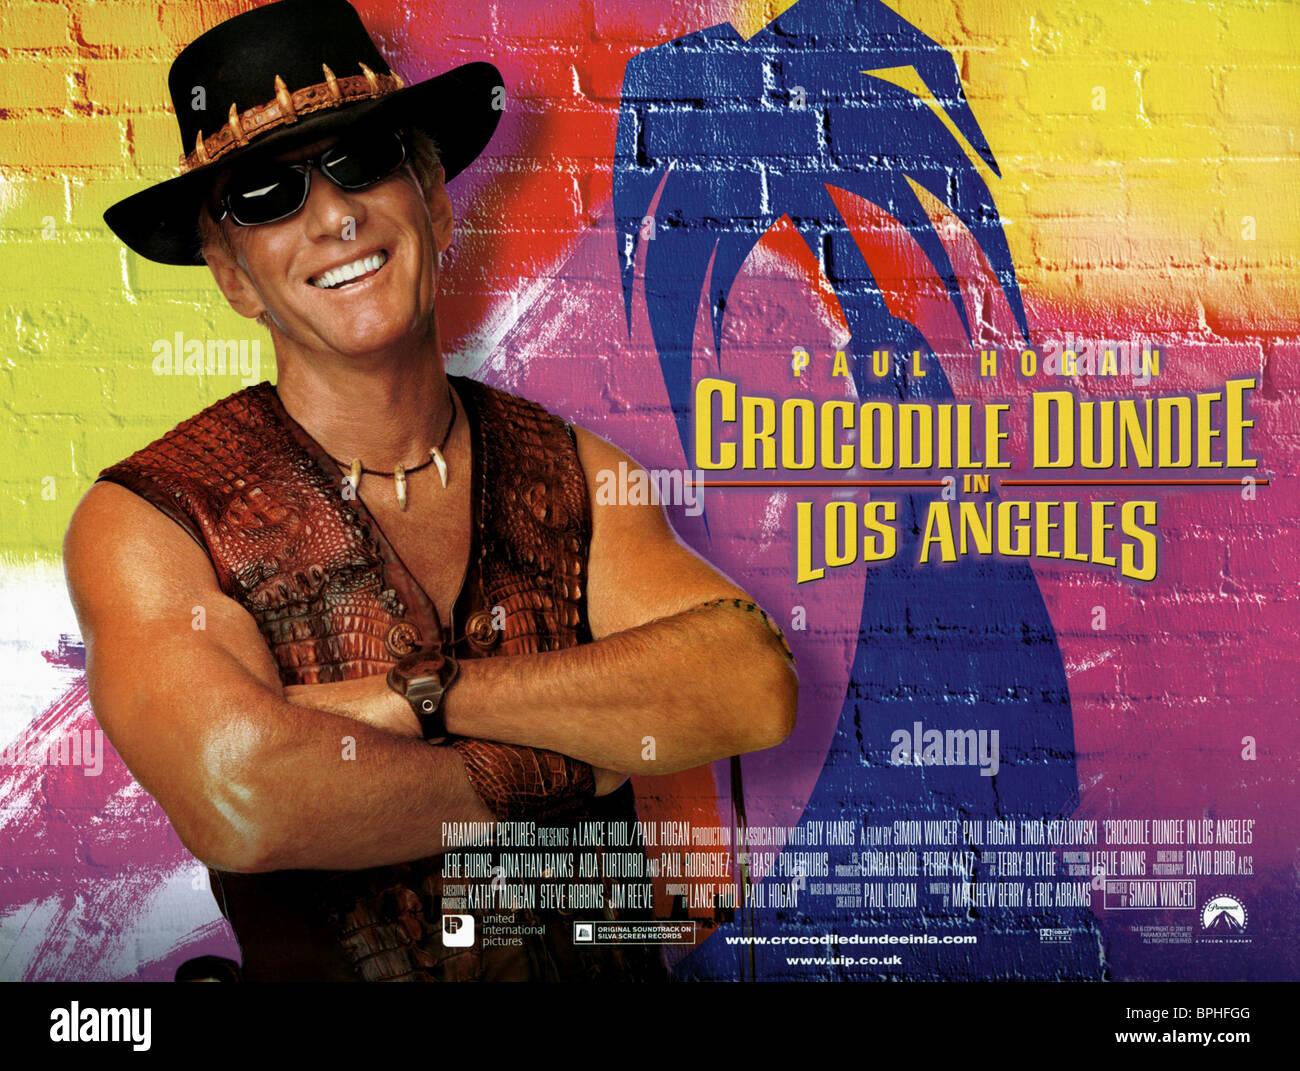 Crocodile Dundee 2 Poster